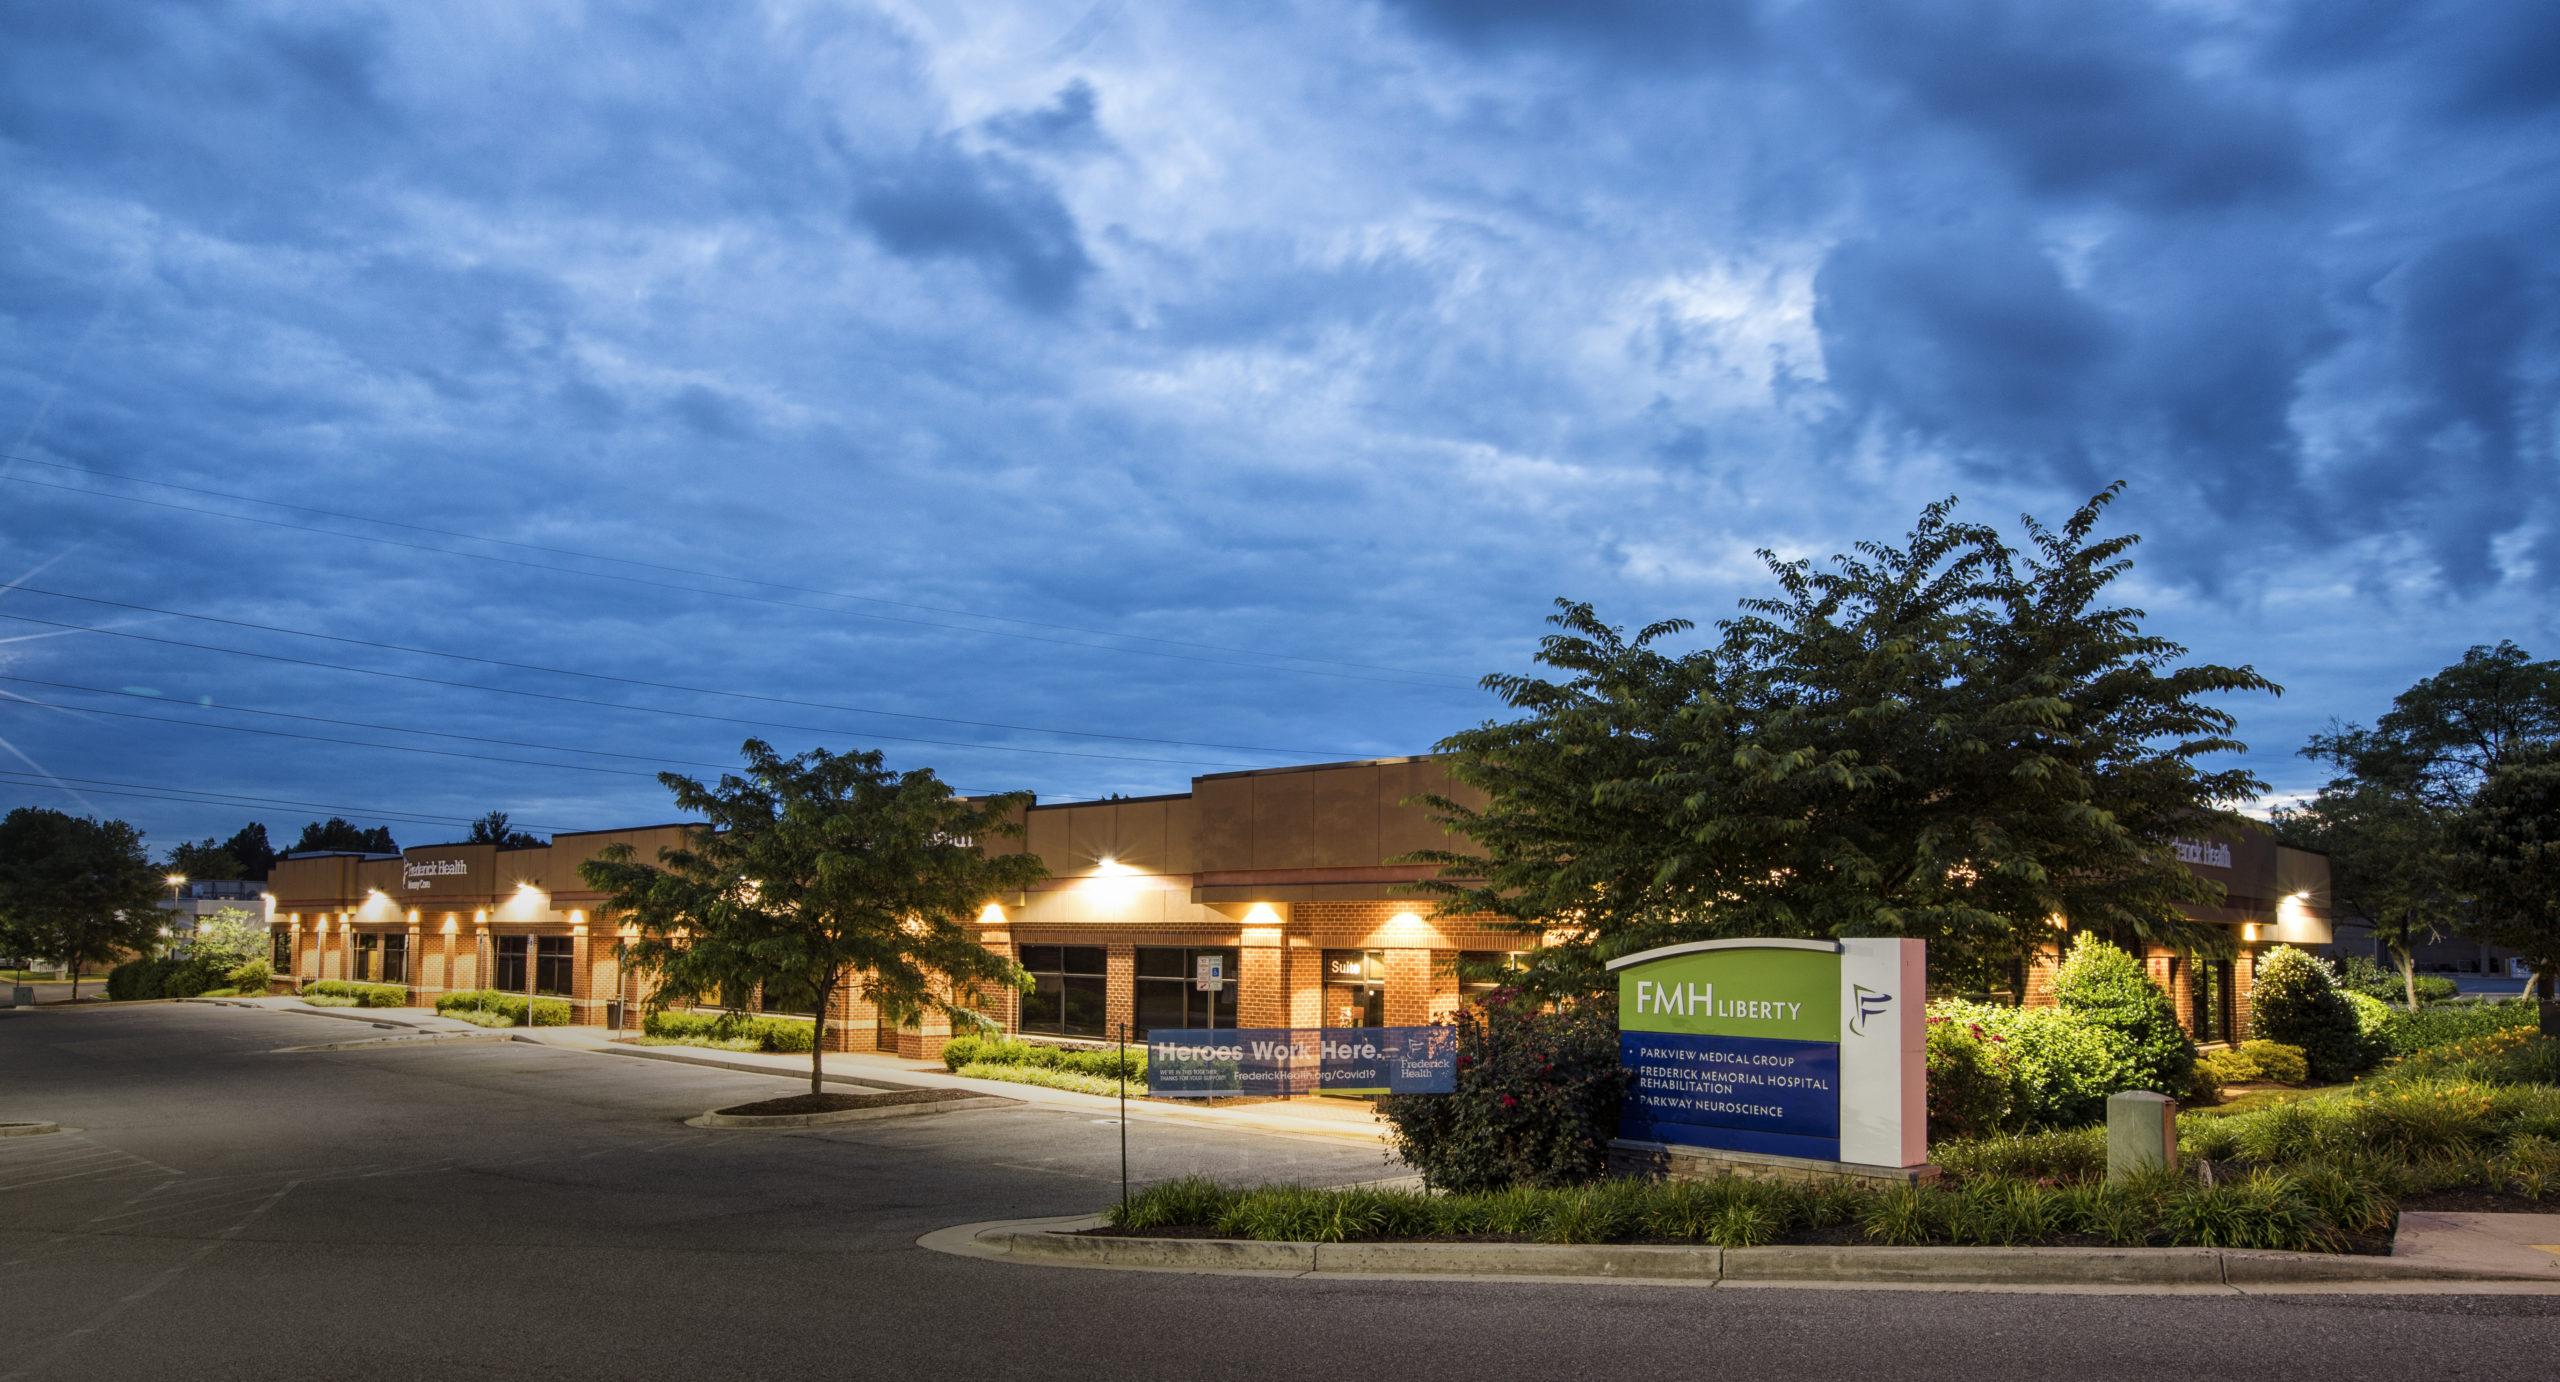 Commercial Property Development - Liberty Professional Center